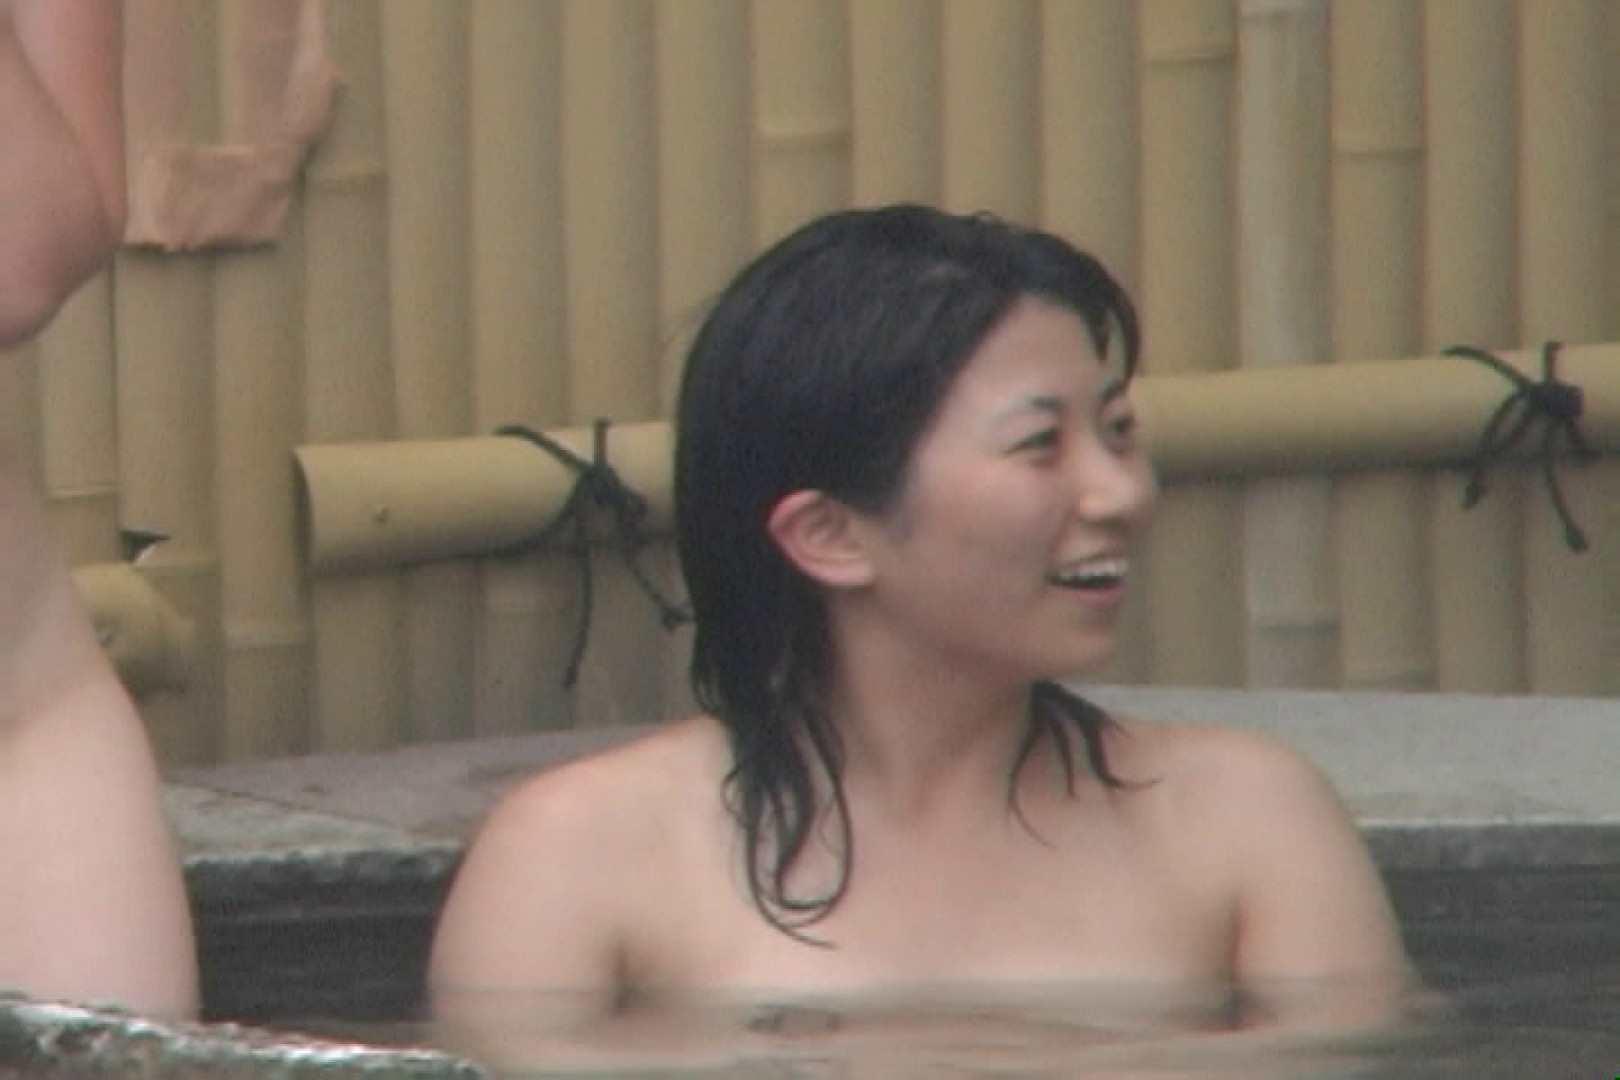 Aquaな露天風呂Vol.43【VIP限定】 OLのプライベート | 盗撮特撮  11pic 7